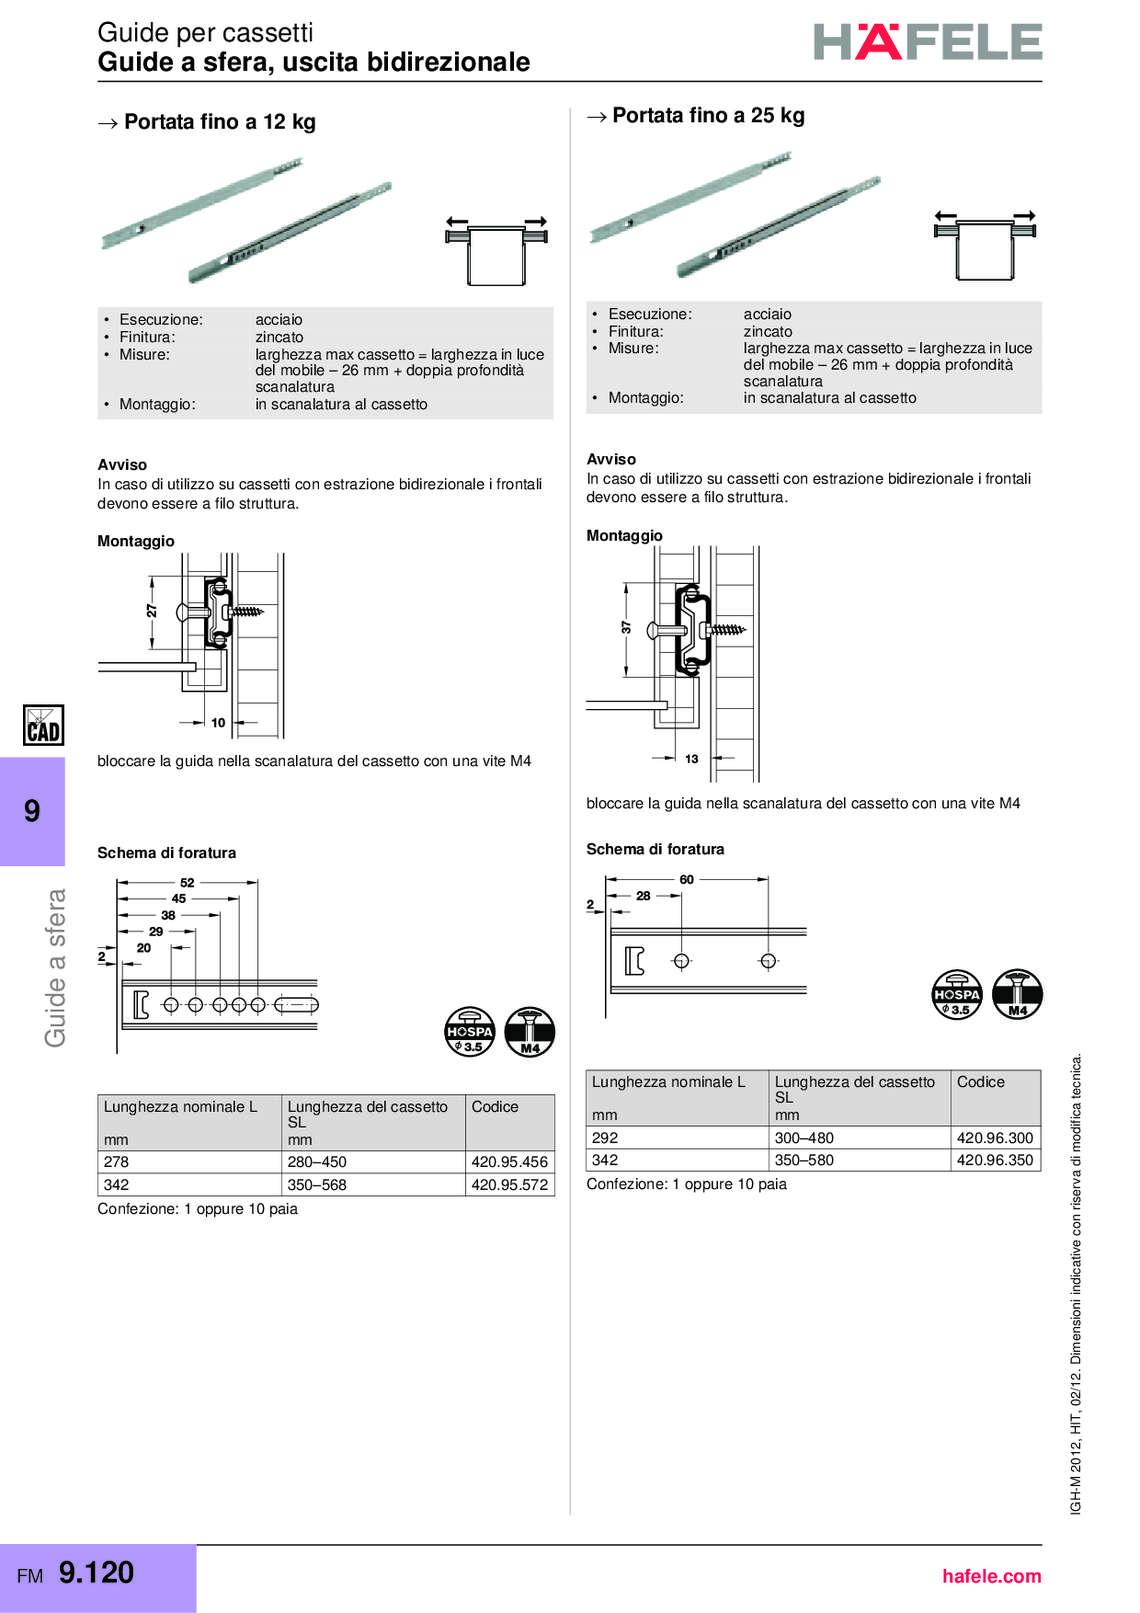 hafele-spondine-e-guide-per-mobili_40_171.jpg